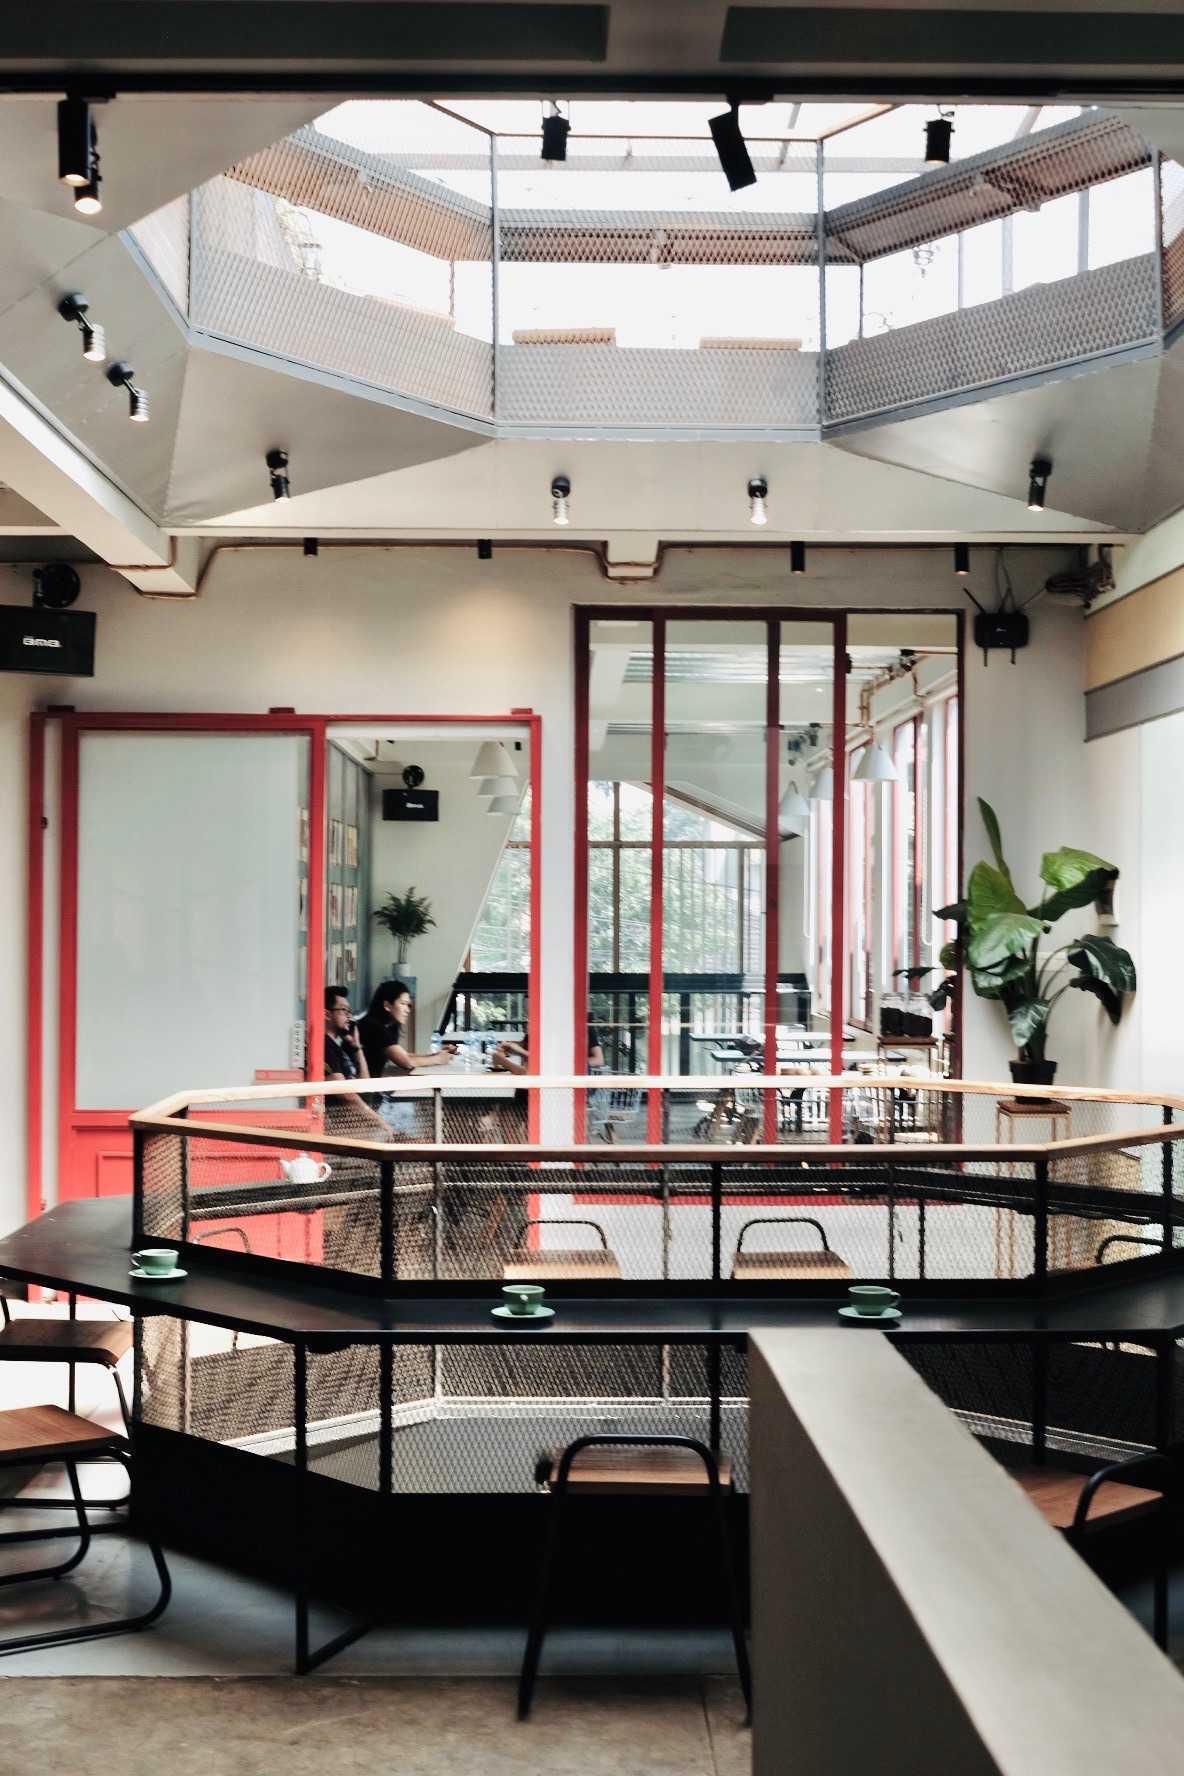 Dinardithen Studio Industrial Bakery House And Coffe At Paskal Bandung, Kota Bandung, Jawa Barat, Indonesia Bandung, Kota Bandung, Jawa Barat, Indonesia Dinardithen-Studio-Industrial-Bakery-House-And-Coffe-At-Paskal  127173